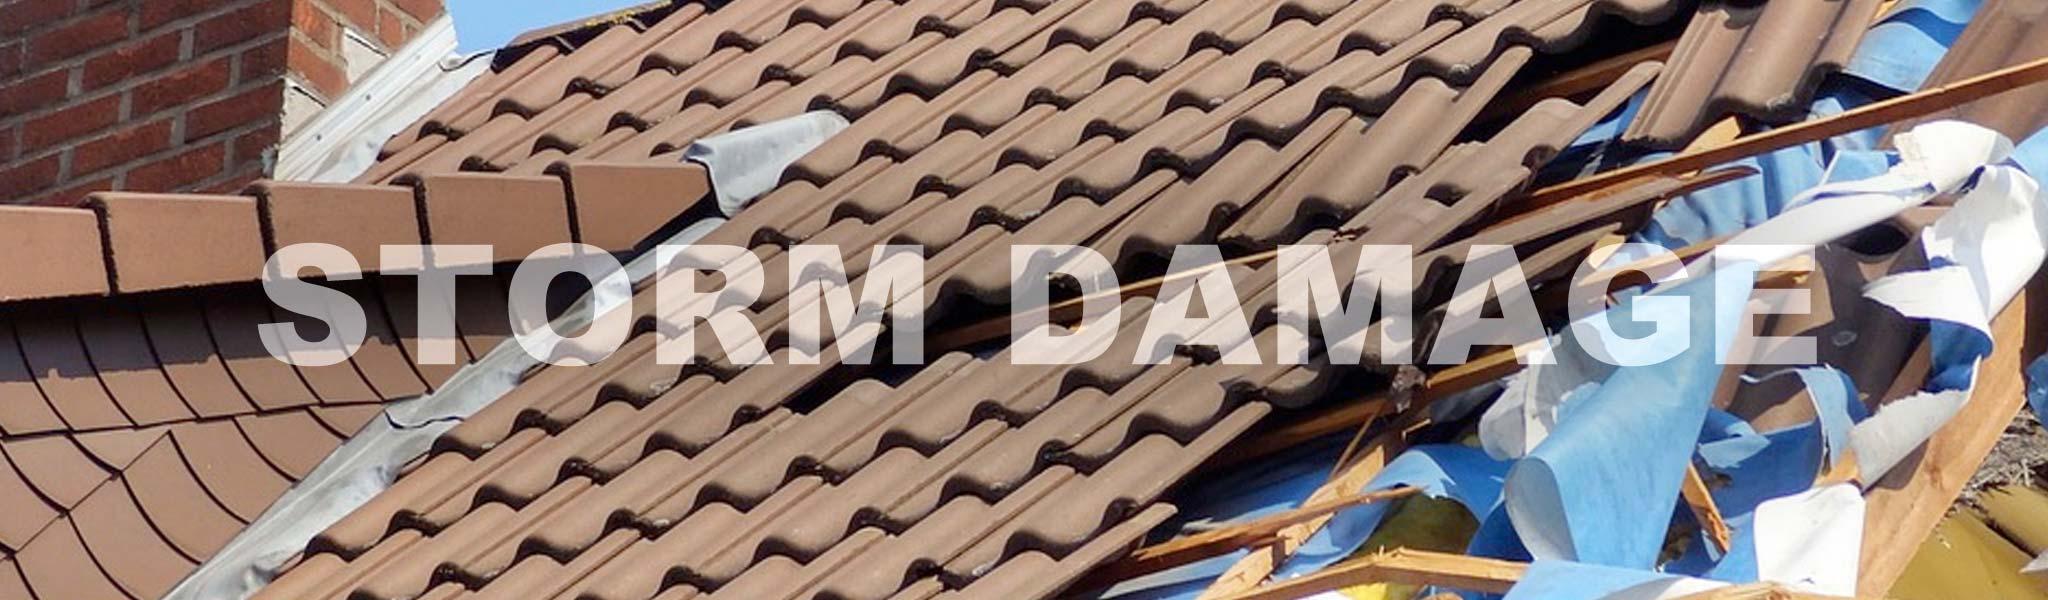 Storm Damage Claims